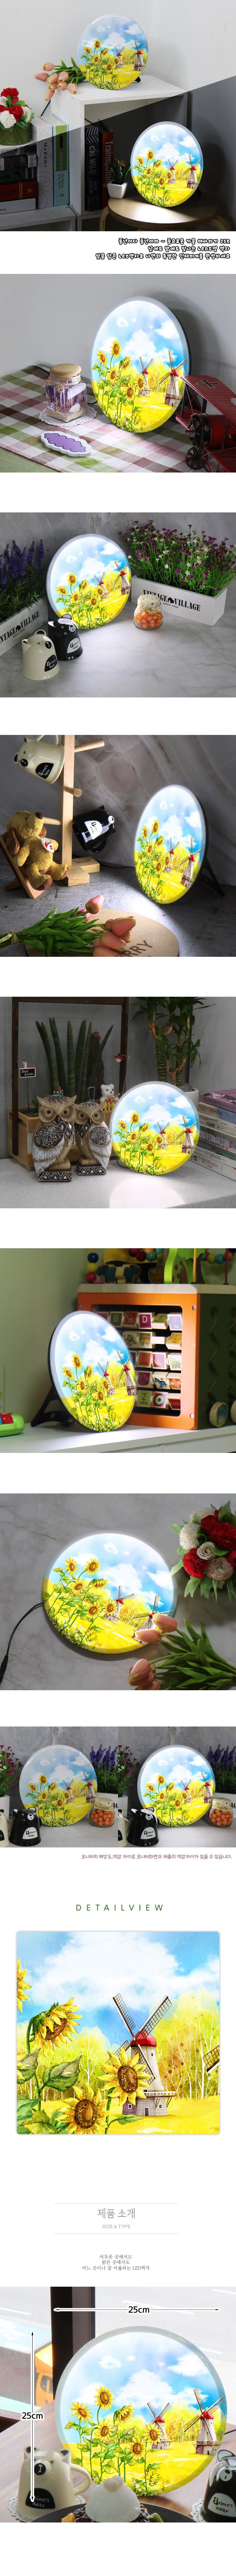 LED액자25R_풍요로운가을해바라기 - 꾸밈, 48,000원, 포인트조명, 터치조명